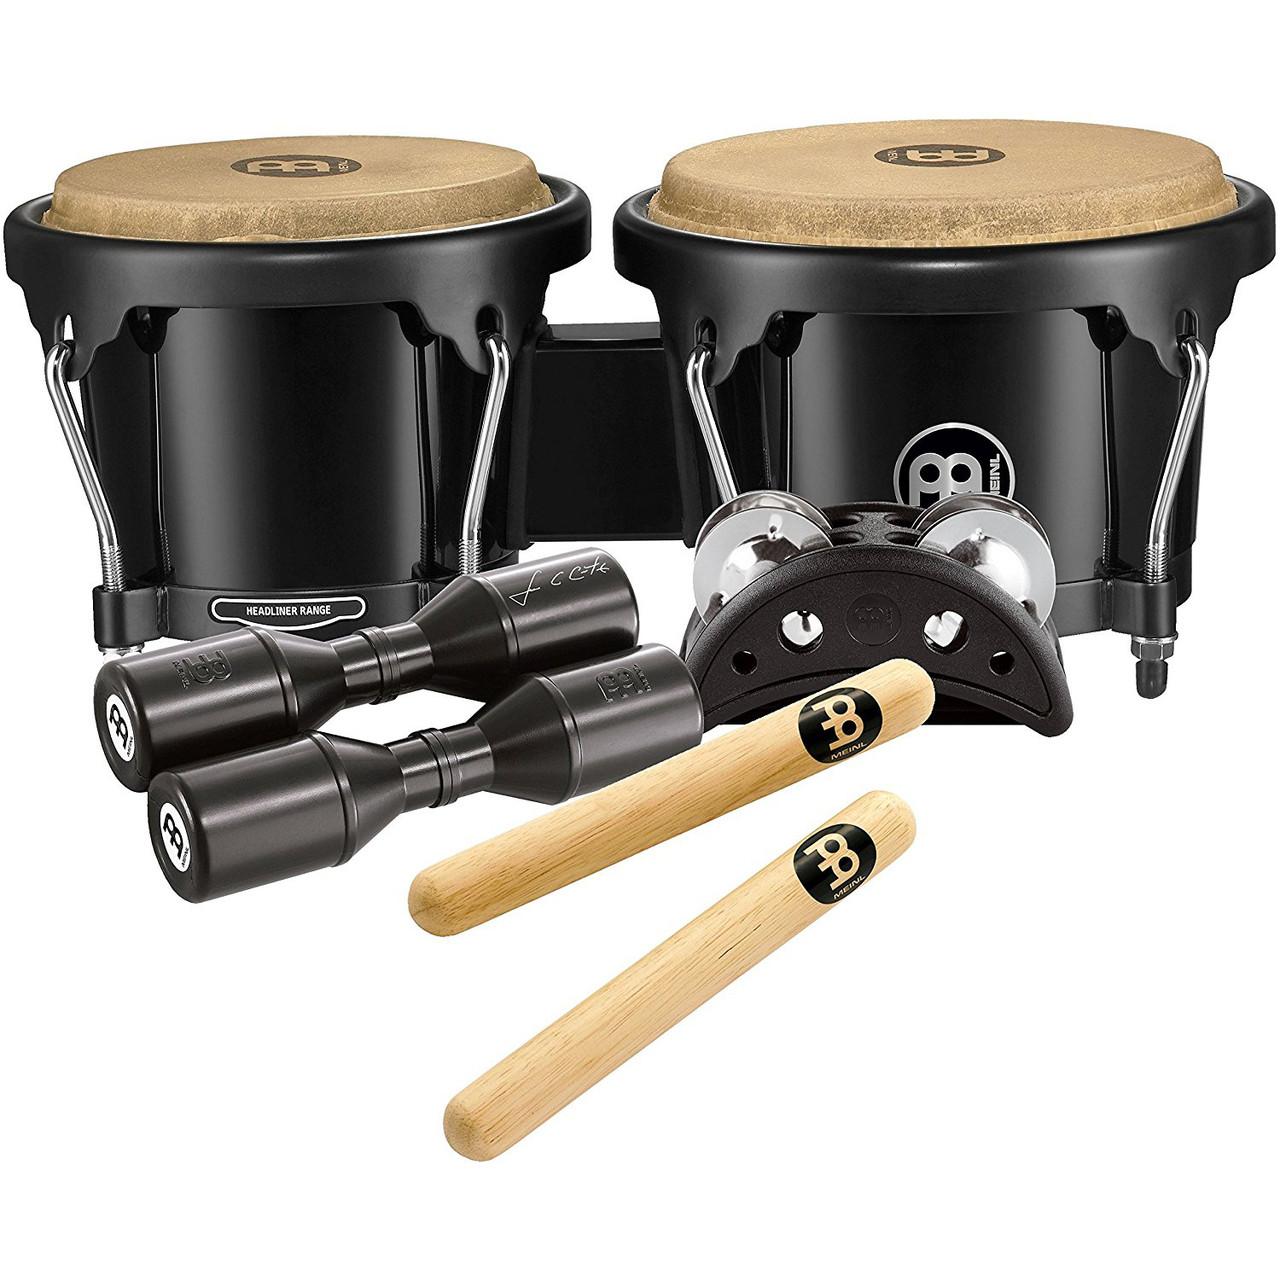 c3720f22cad0 Meinl Percussion BPP-1 Bongo Jam Pack - X8 Drums